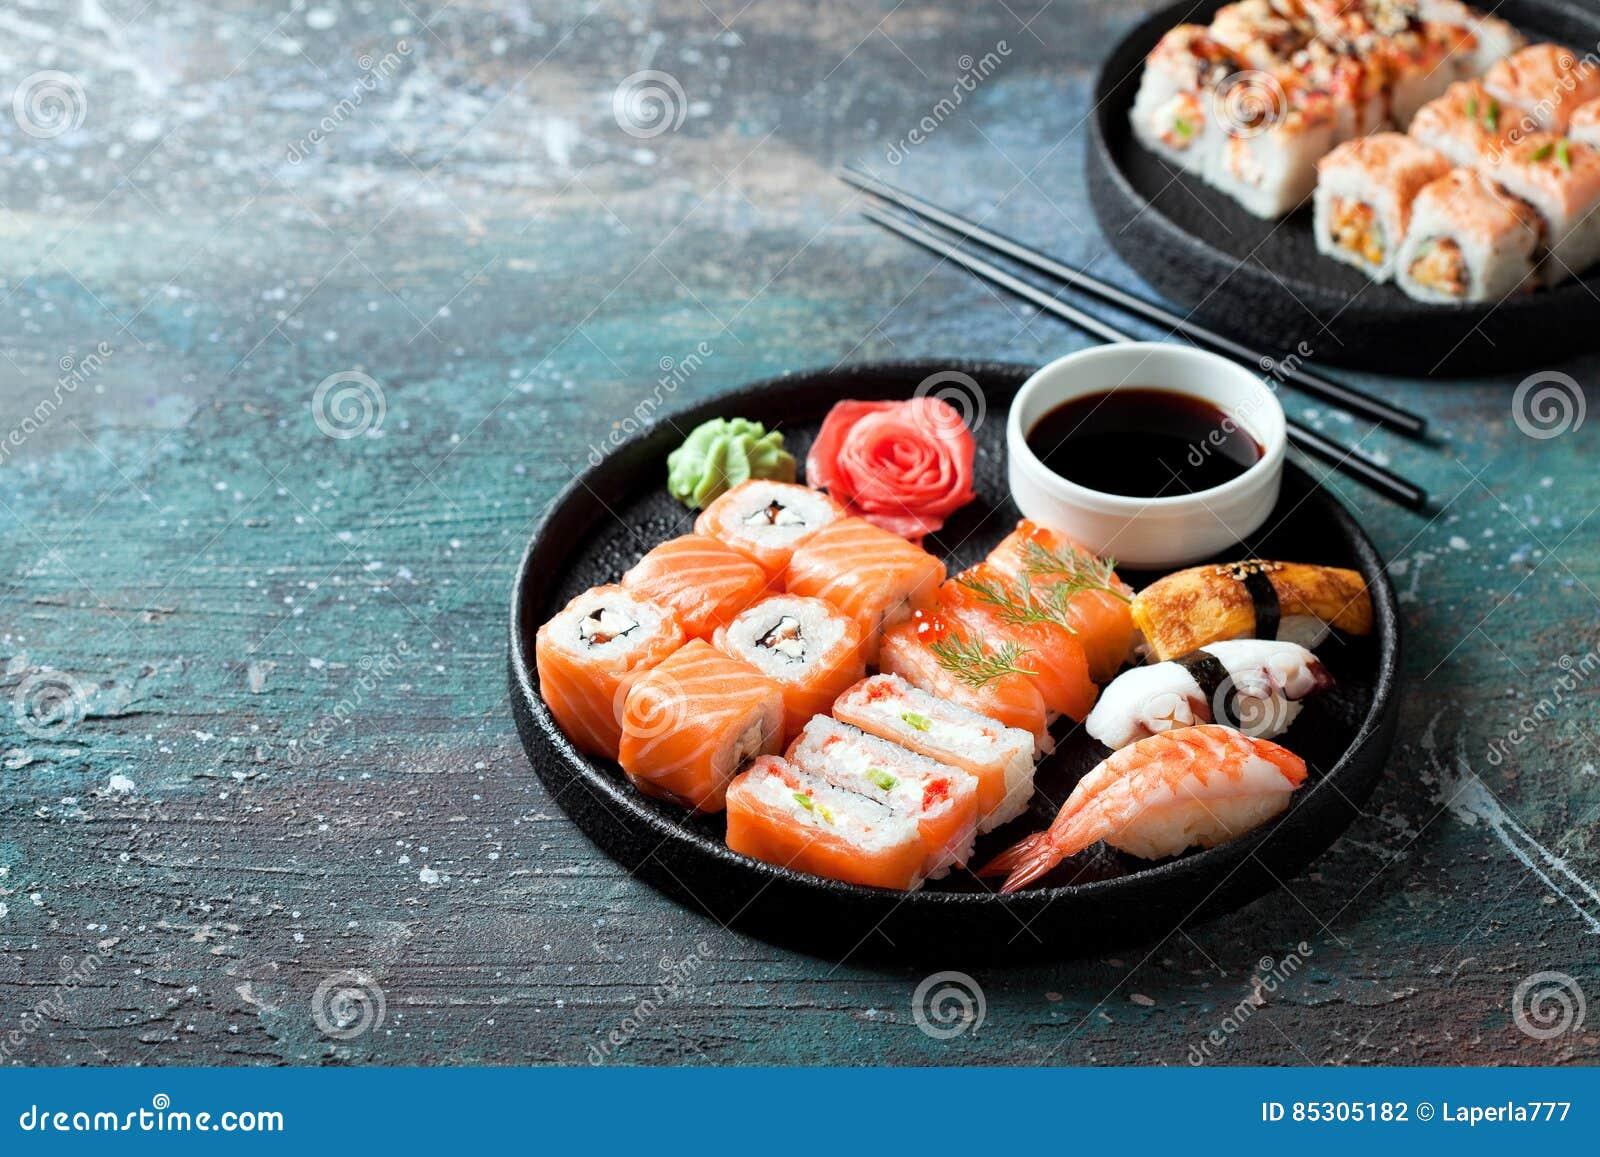 Sushi set nigiri and rolls served in round plate